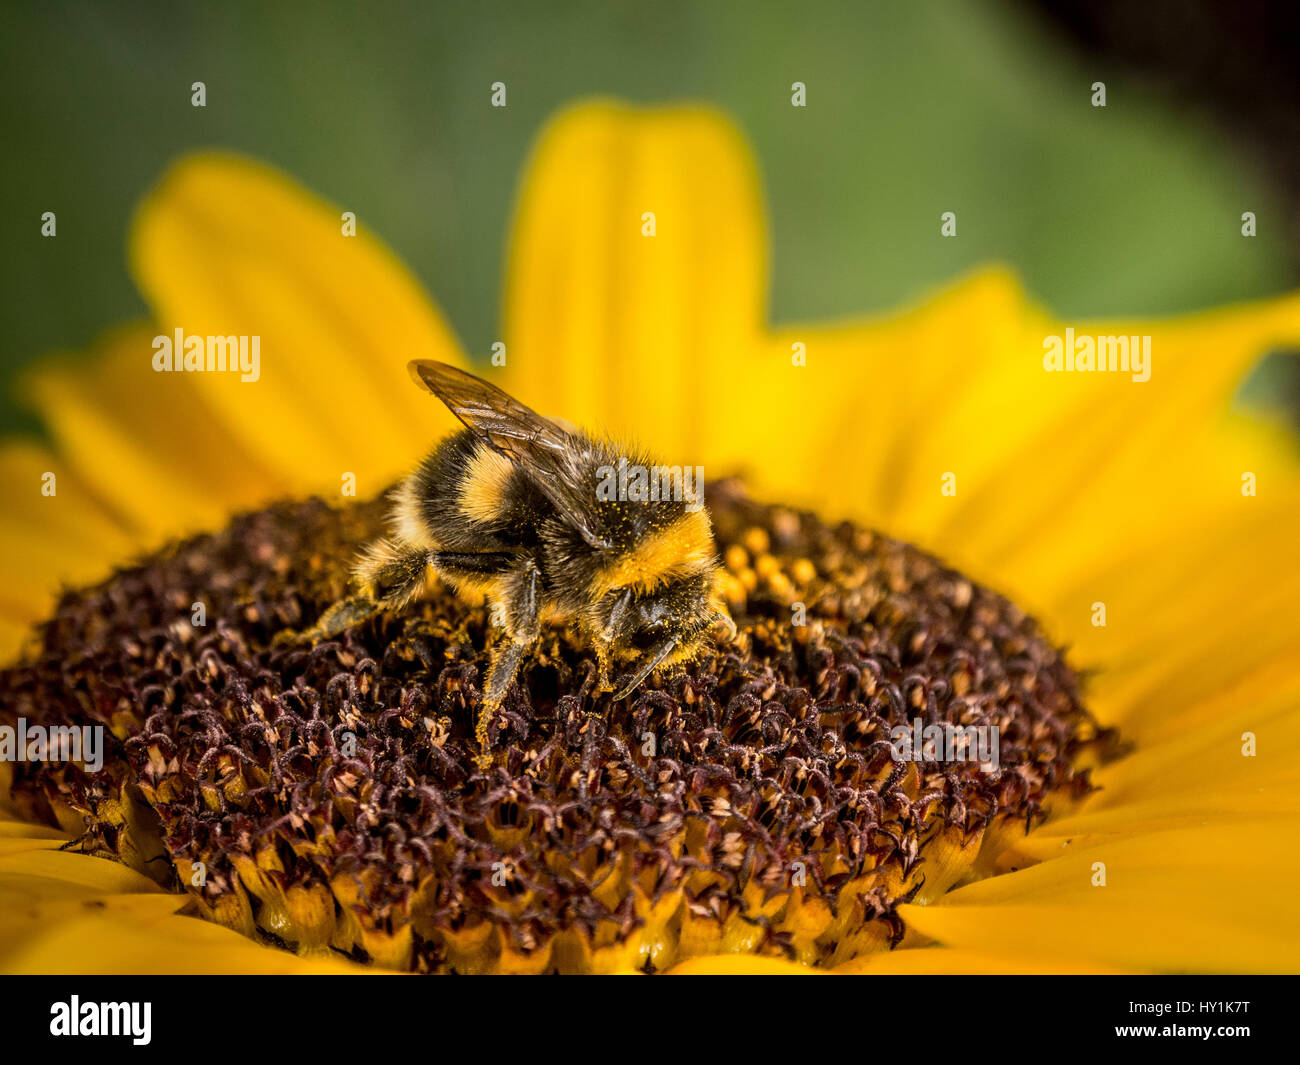 Munchkin dwarf sunflower with bee - Stock Image